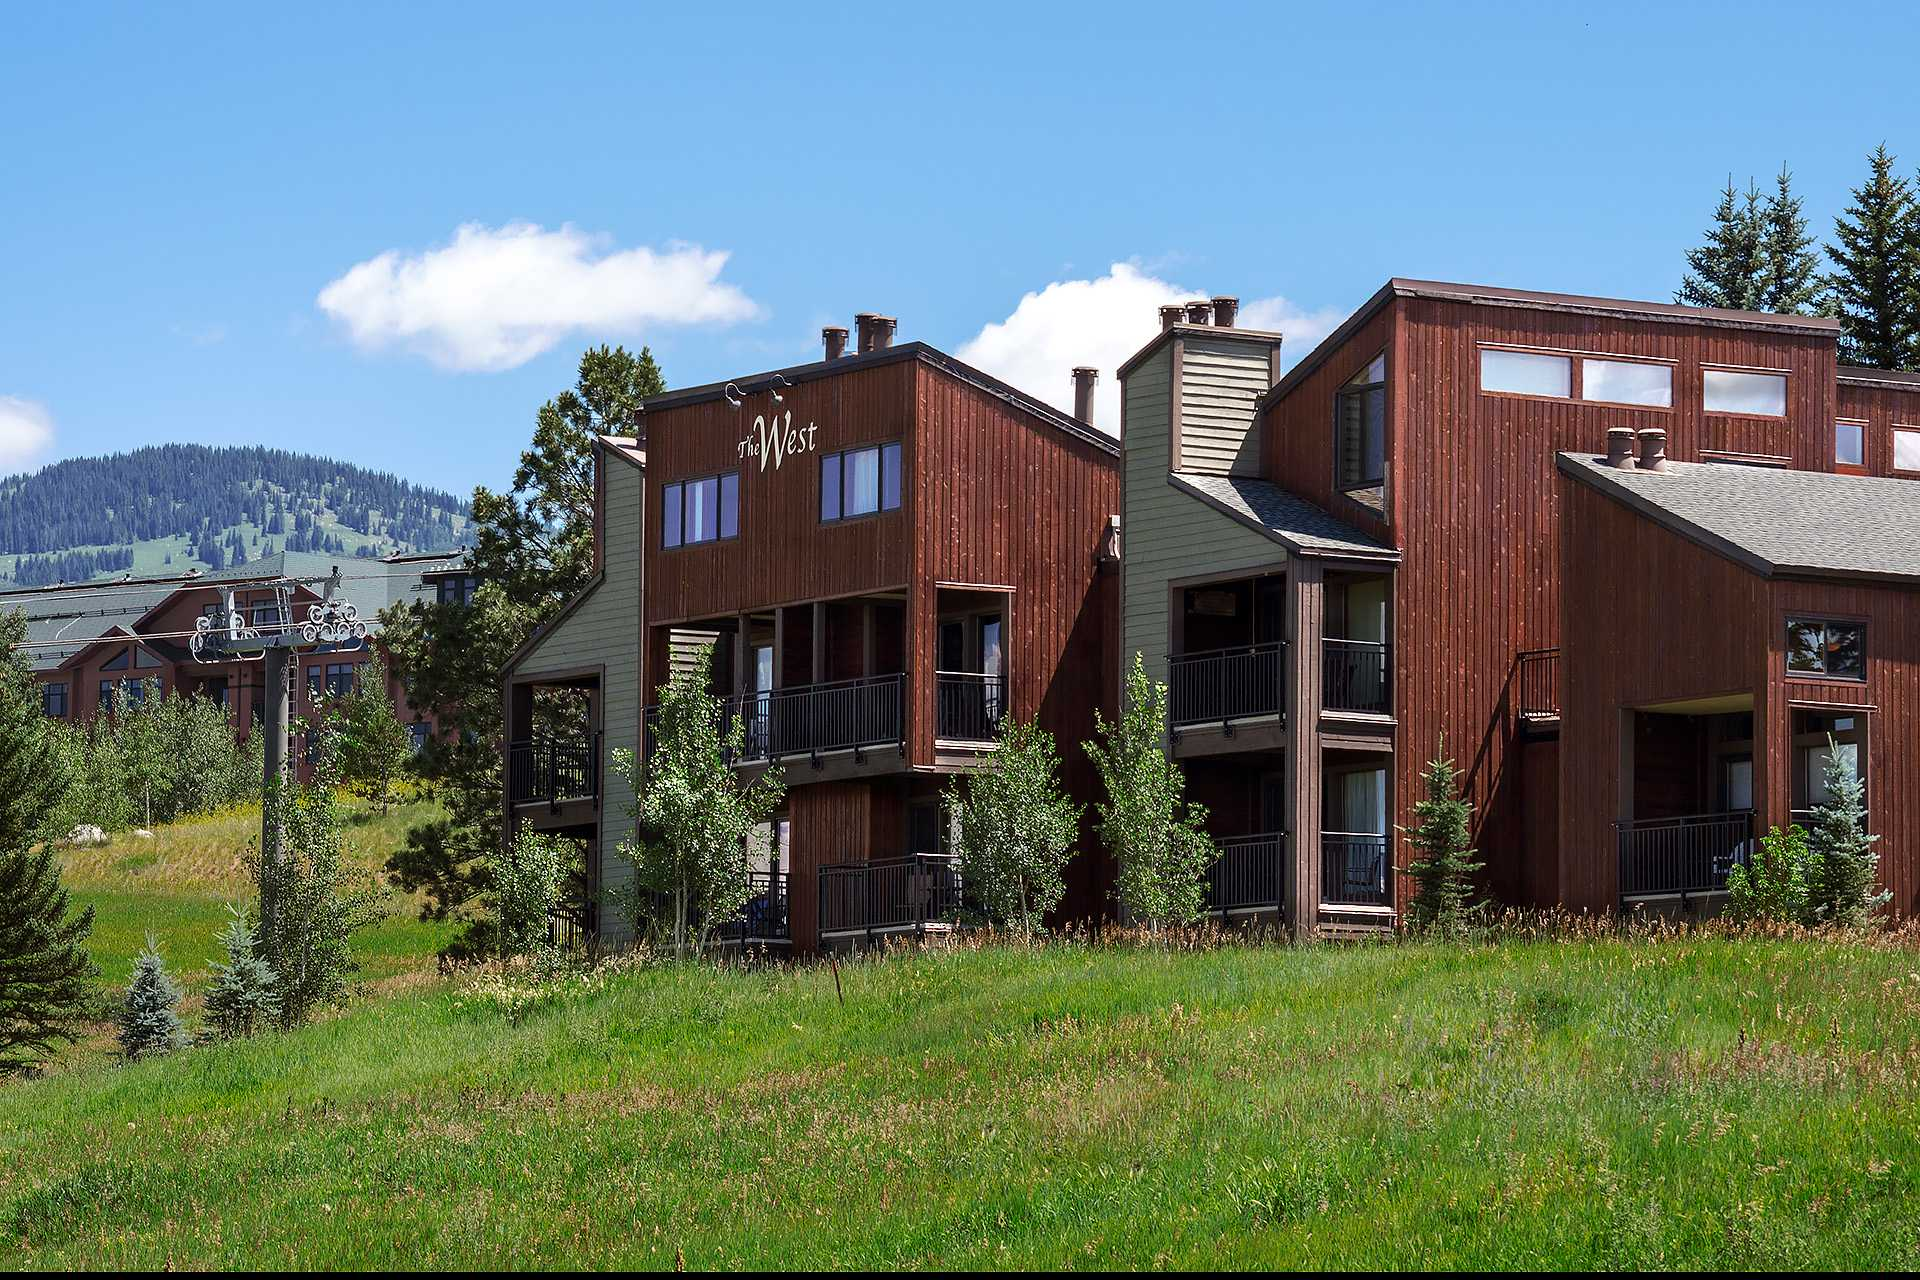 W3224: The West Condominiums